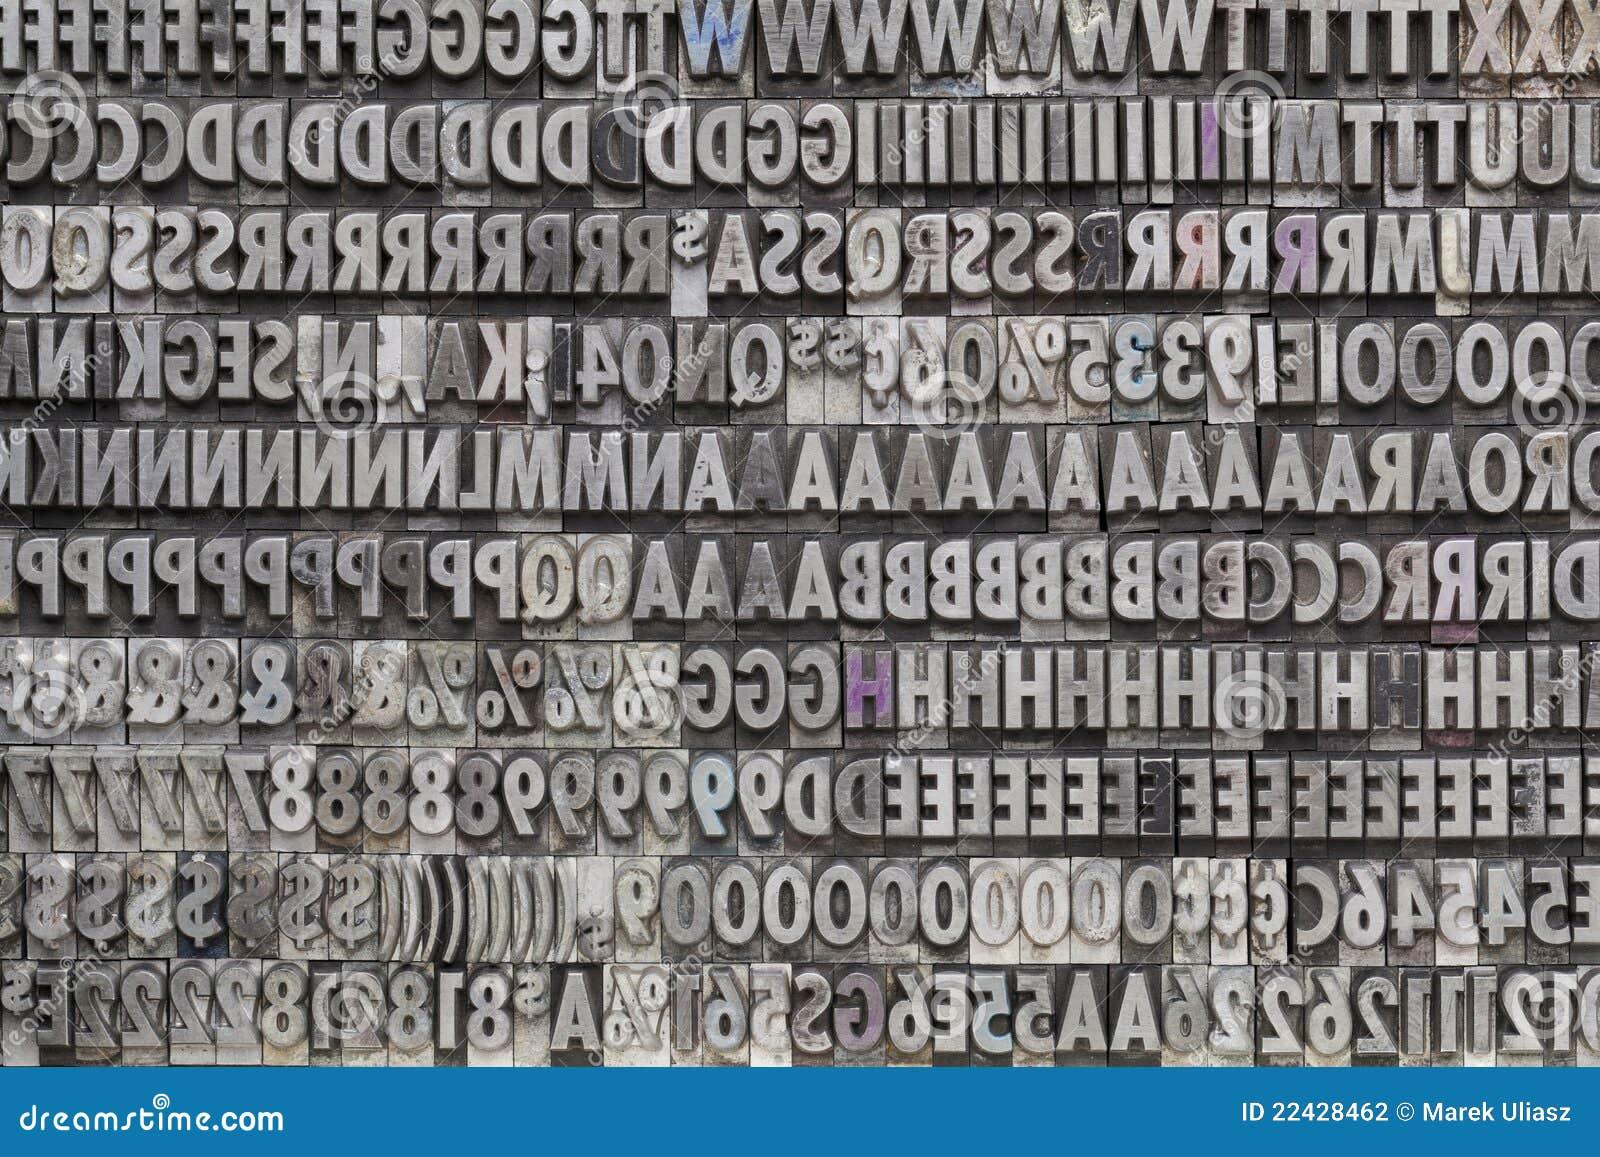 Metal Letters And Numbers Glamorous Vintage Metal Letters And Numbers Stock Photo  Image Of Metal 2018